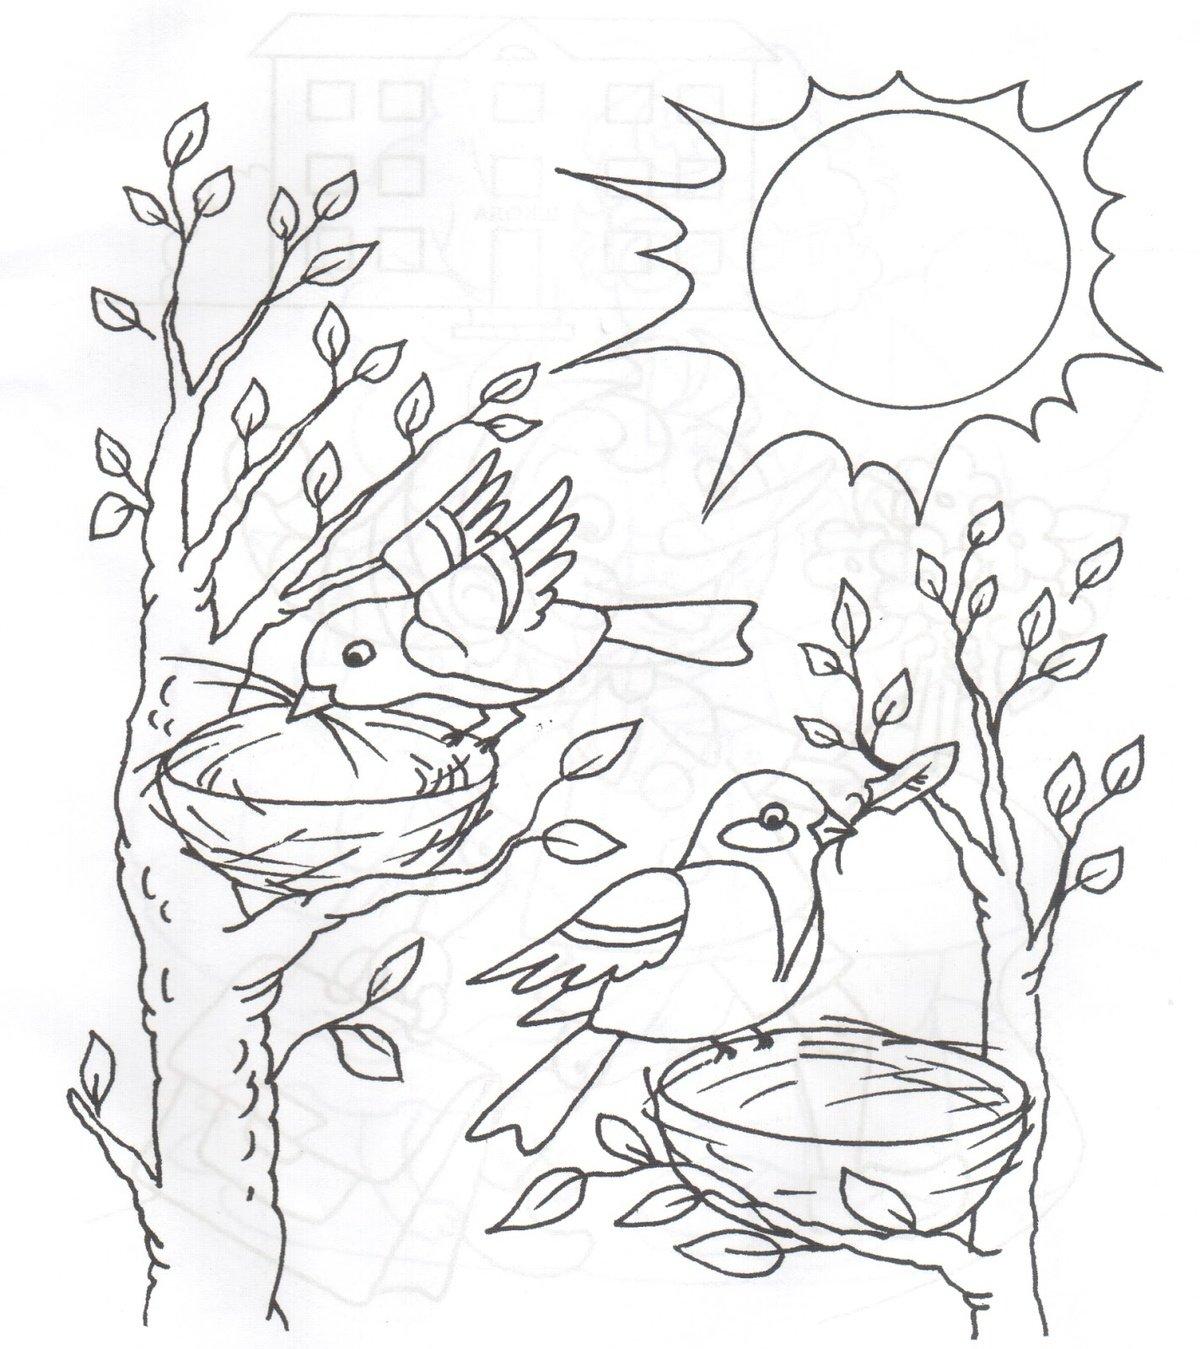 Картинки раскраски про весну целая